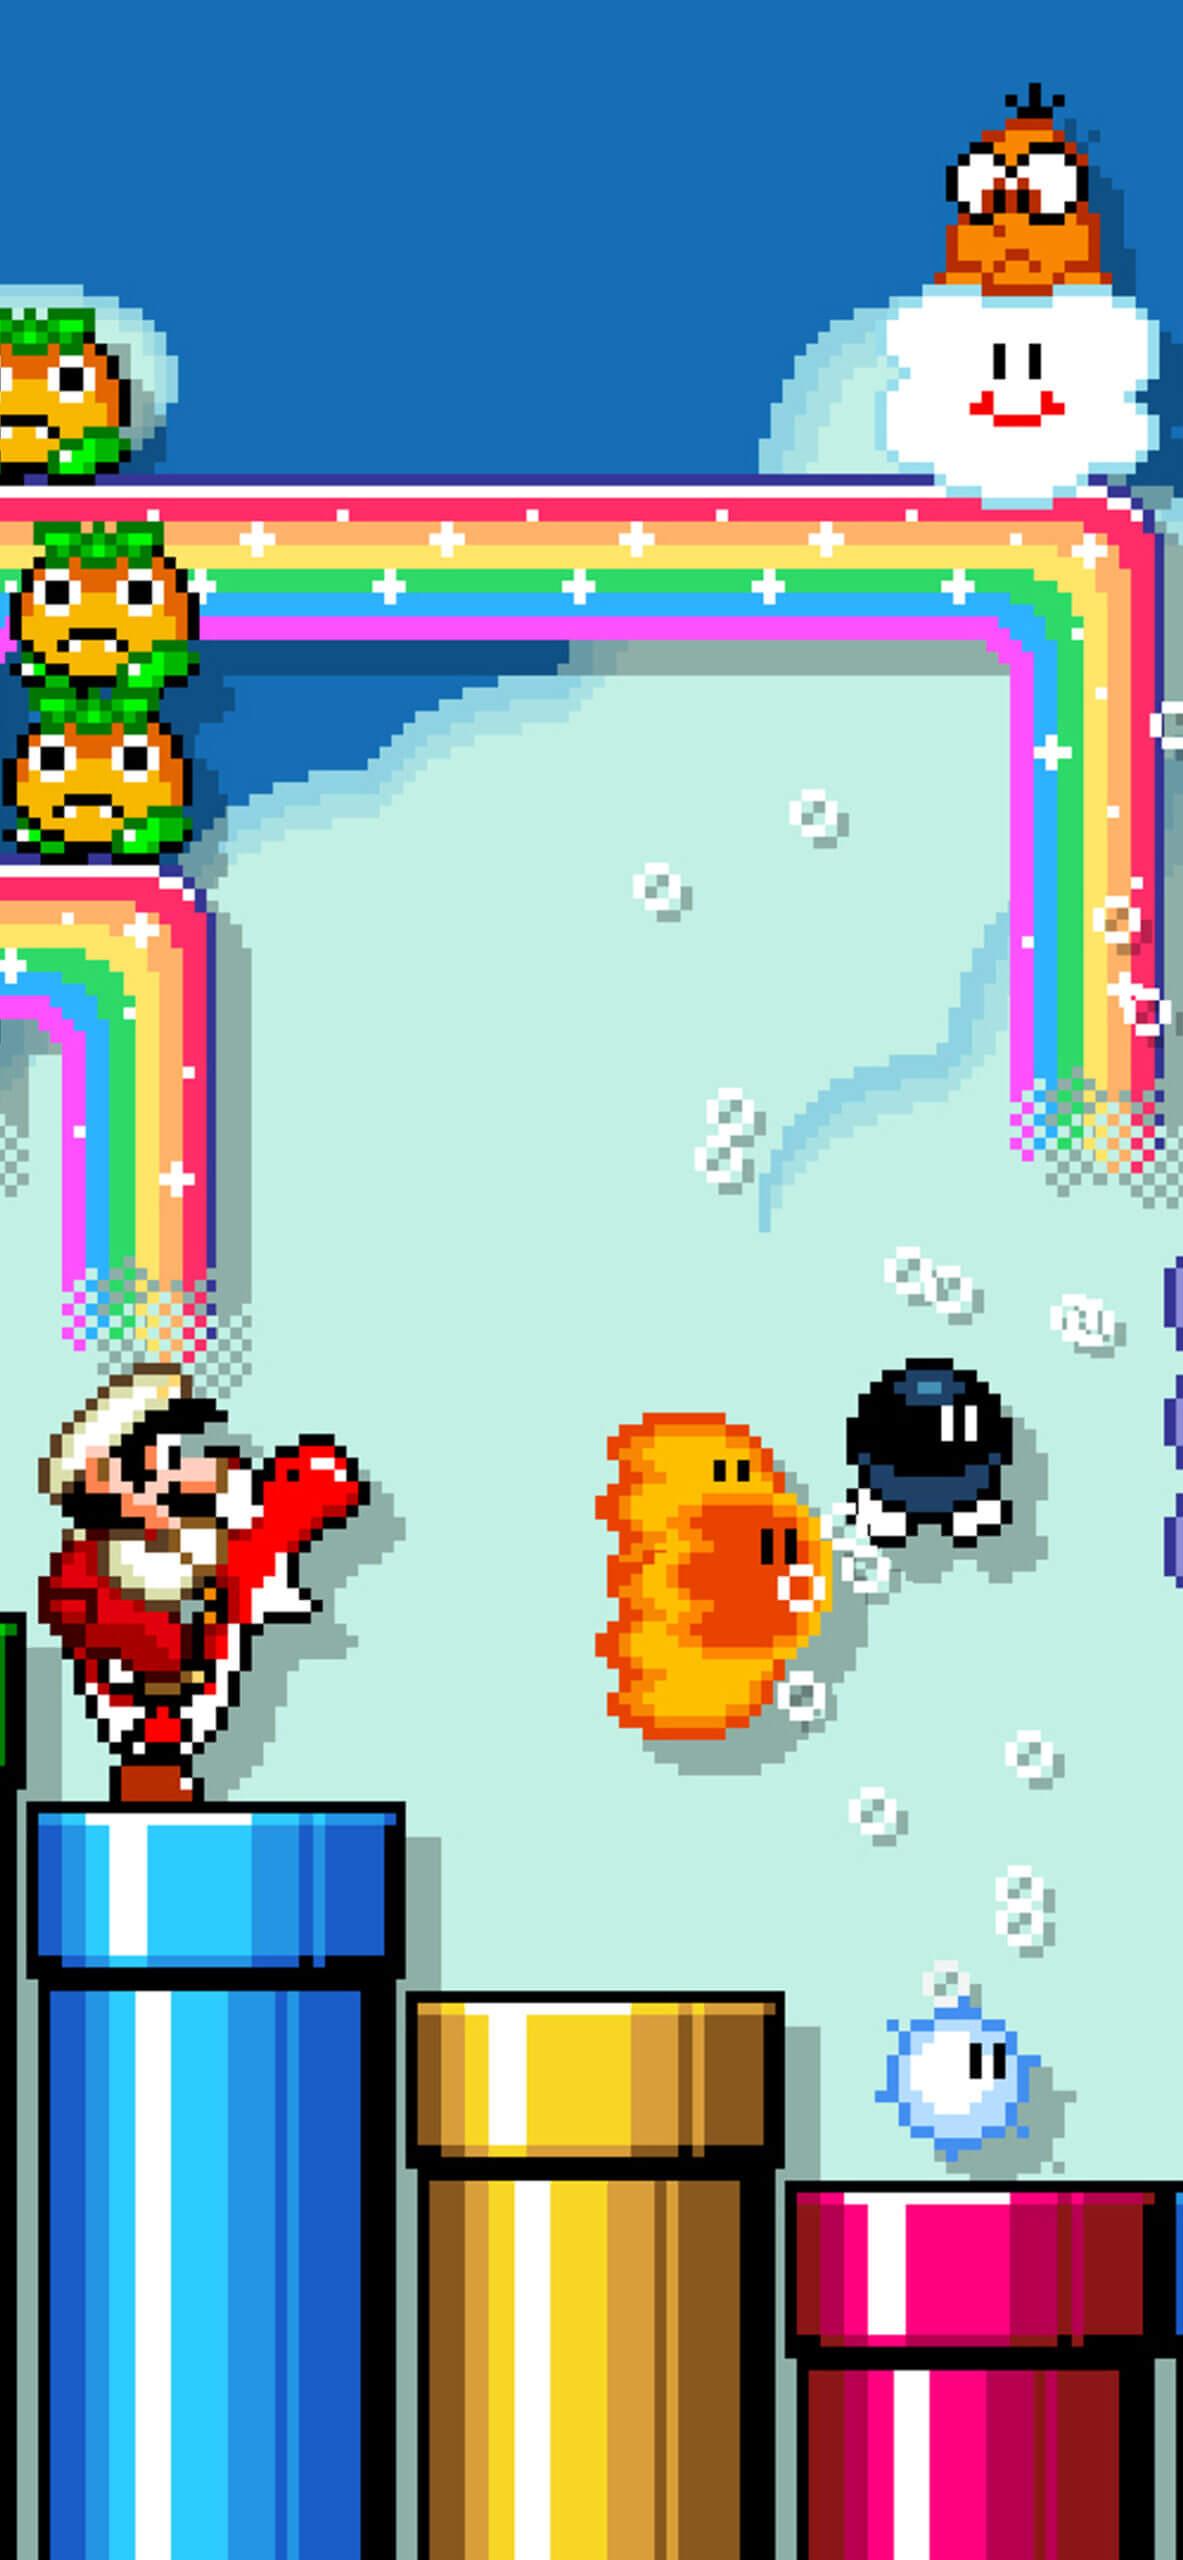 Super Mario Maker 2 Nintendo iPhone wallpaper scaled